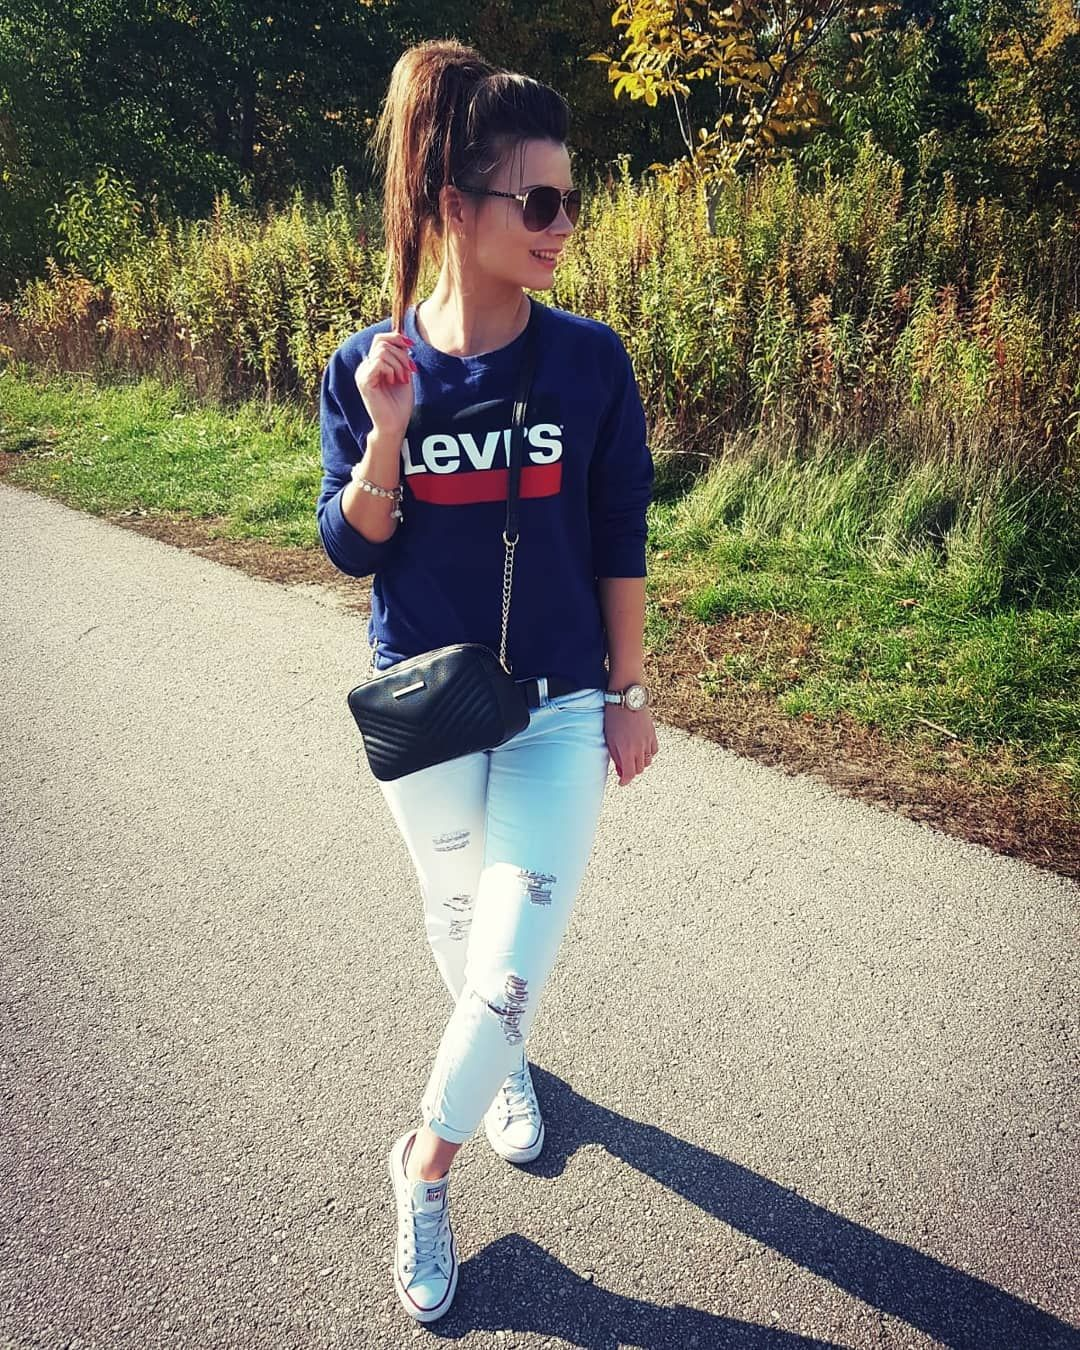 Sunday 🌞🍁 #warsawgirl #polishgirl #polishwoman #polskadziewczyna #polskakobieta #outfit #style #streetstyle #fashion #ootd #brunetka #brunette #brunettehair #brunettegirl #instagood #polishinsta #photooftheday #picoftheday #happy #smile #love View this post on Instagram Sunday 🌞🍁 . . . #warsawgirl #polishgirl #polishwoman #polskadziewczyna #polskakobieta #outfit #style #streetstyle #fashion #ootd #brunetka #brunette #brunettehair #brunettegirl #instagood #polishinsta #photooftheday #picofthe